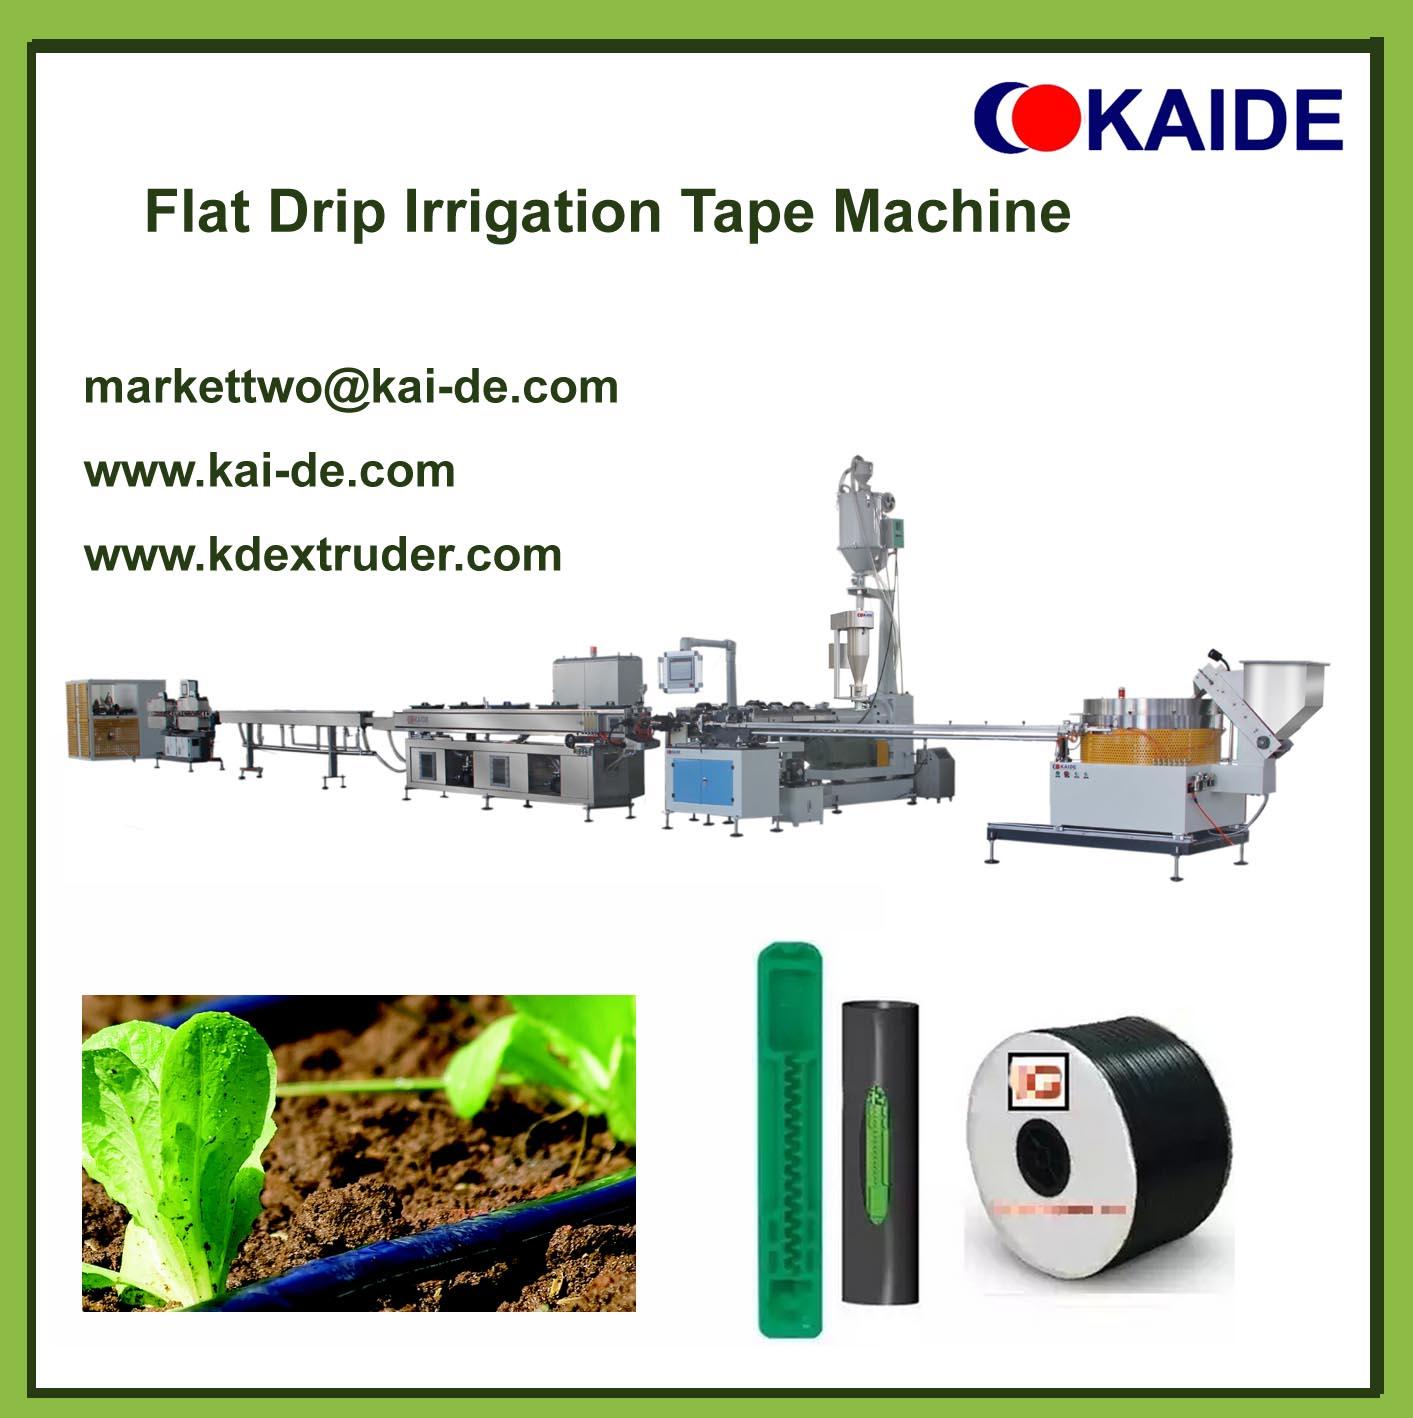 Flat drip irrigation pipe machine 16mmx0.15mm